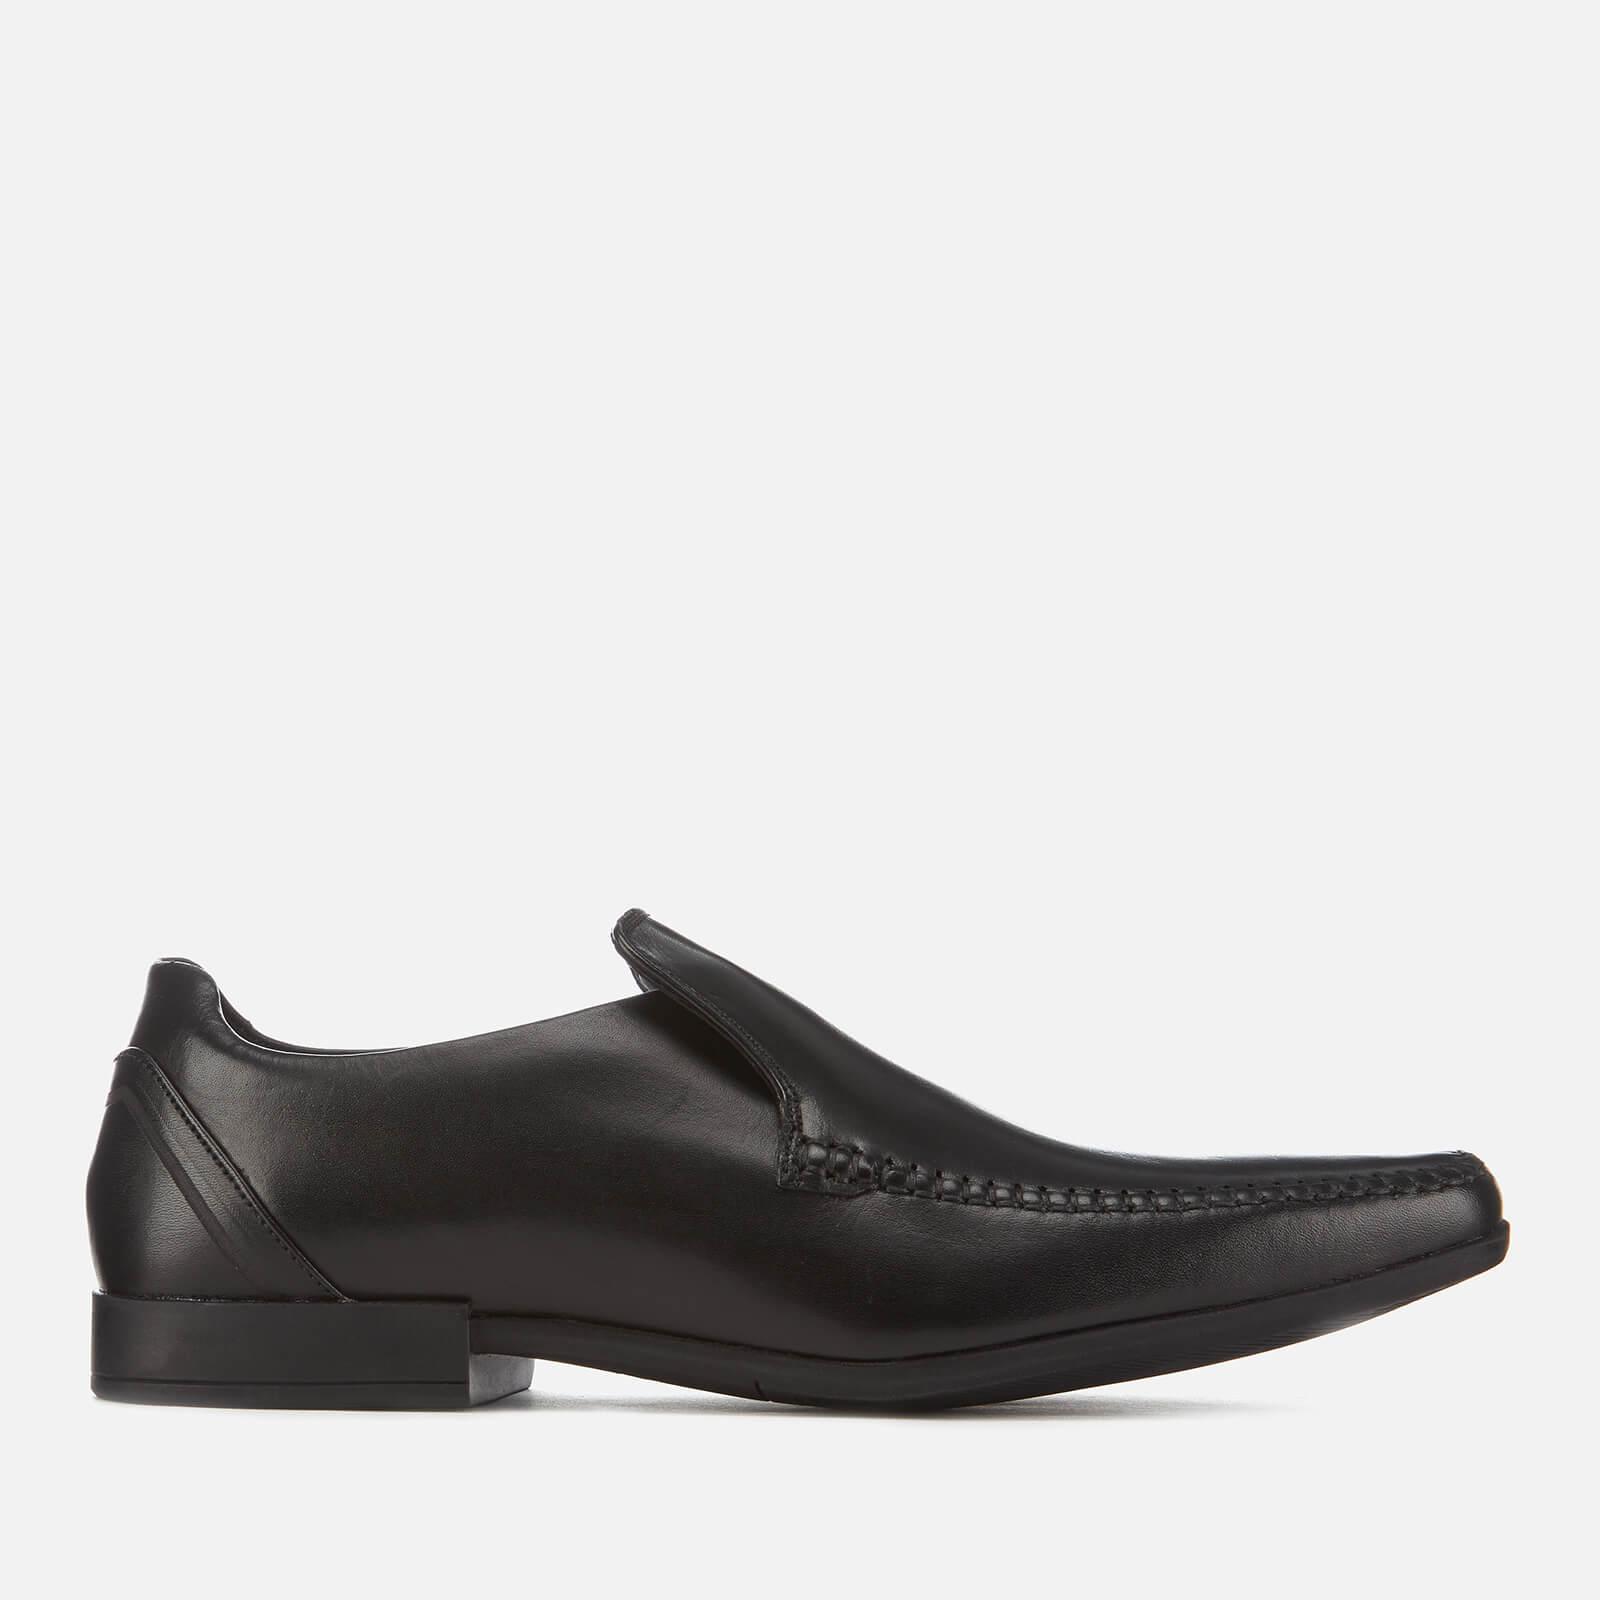 Clarks 其乐 Glement Seam 男士乐福鞋